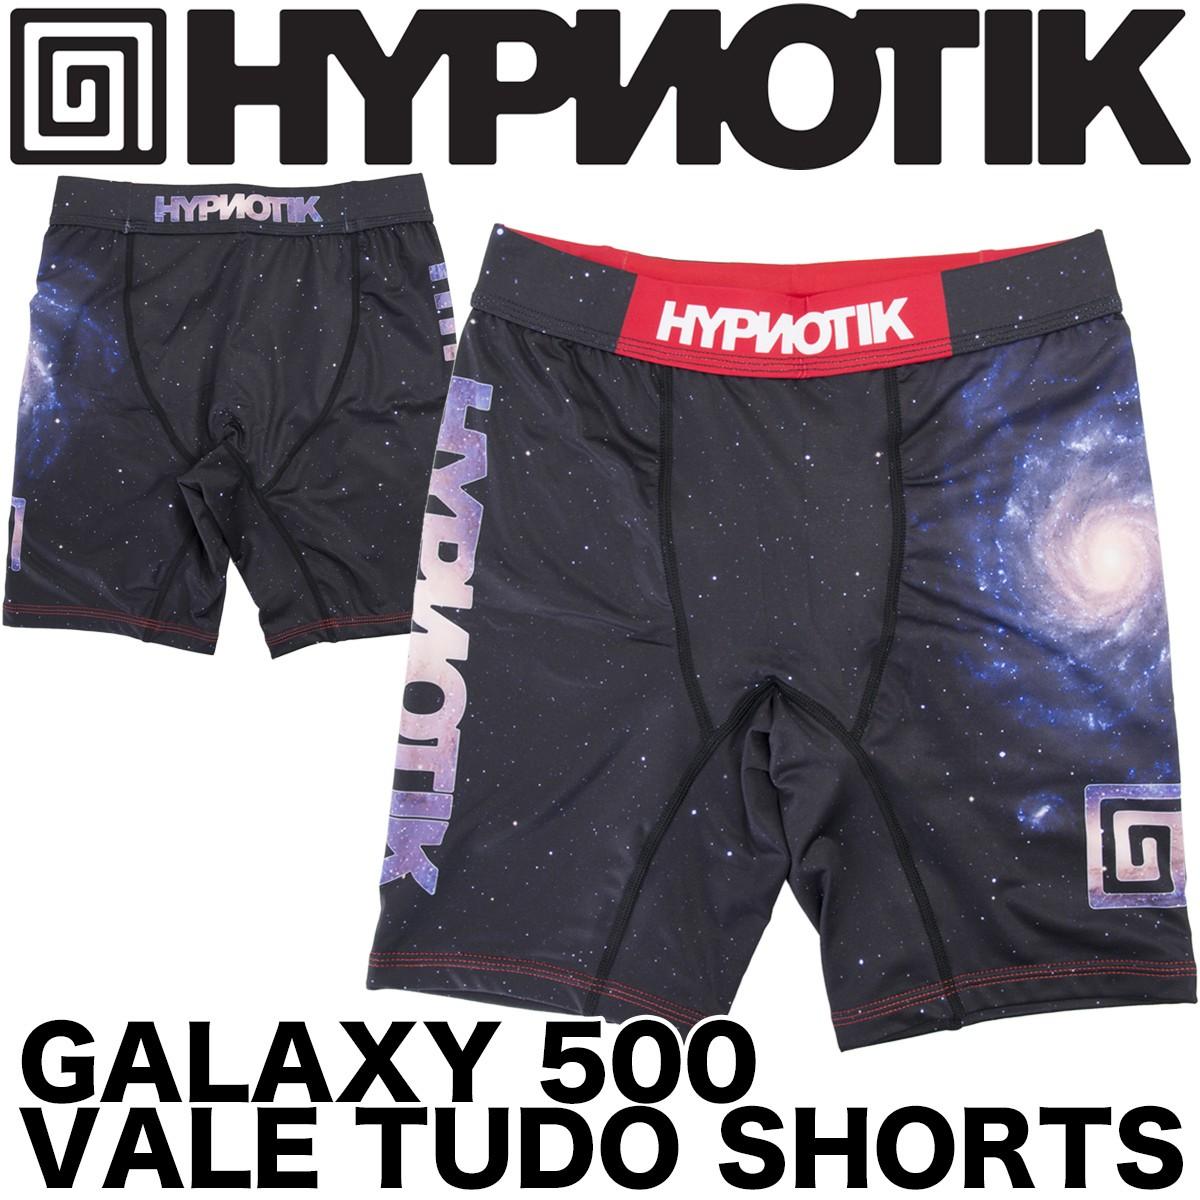 HYPNOTIK GALAXY 500 VALE TUDO SHORTS